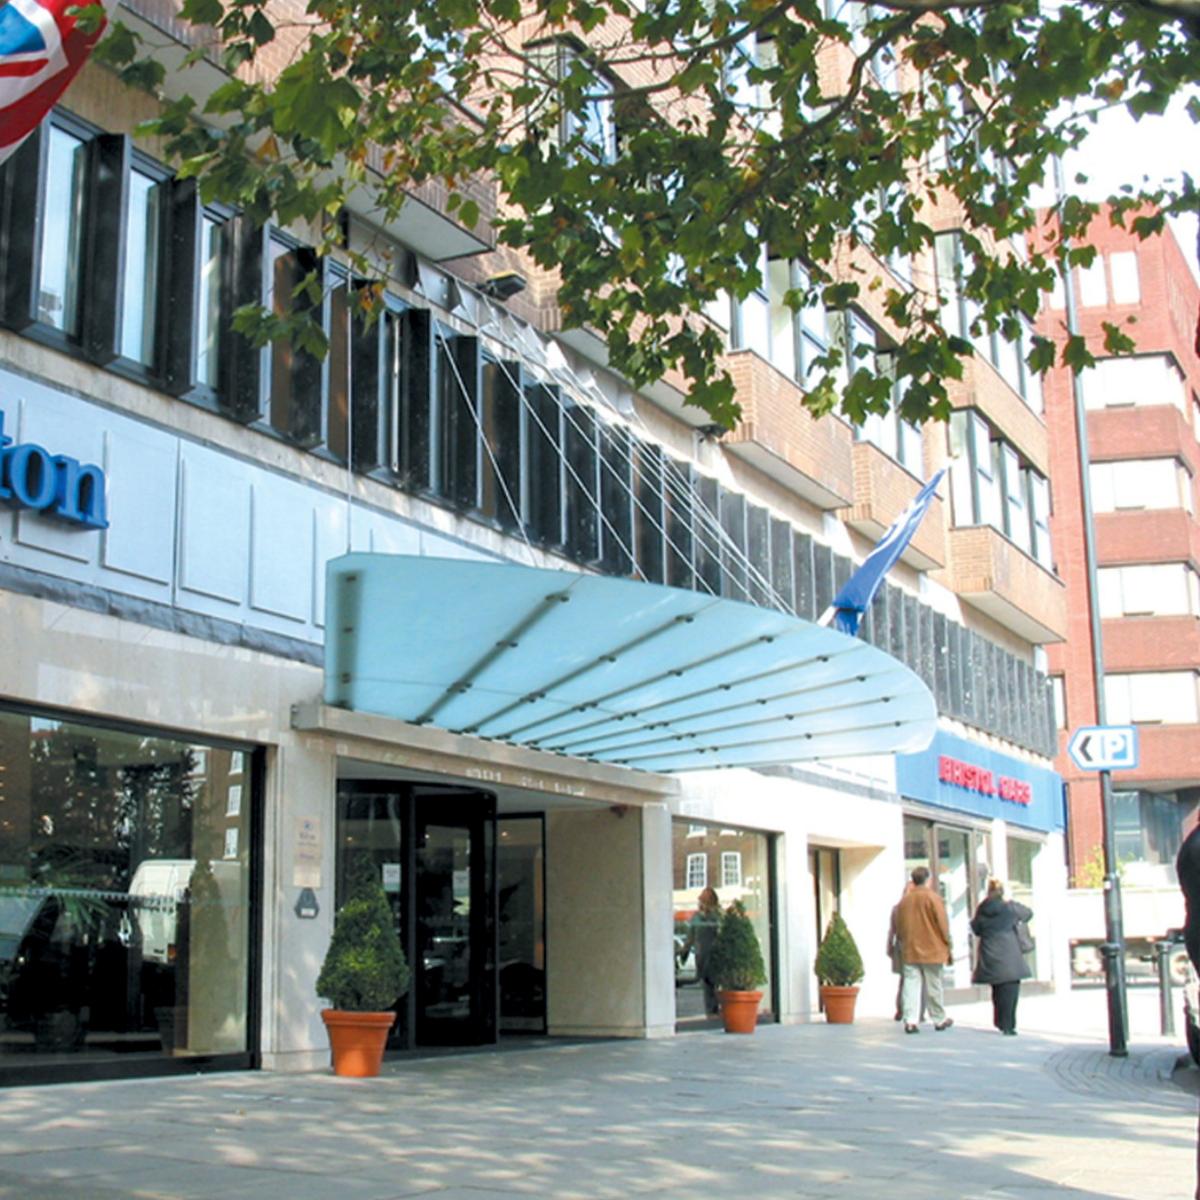 Hilton Entrance Canopy